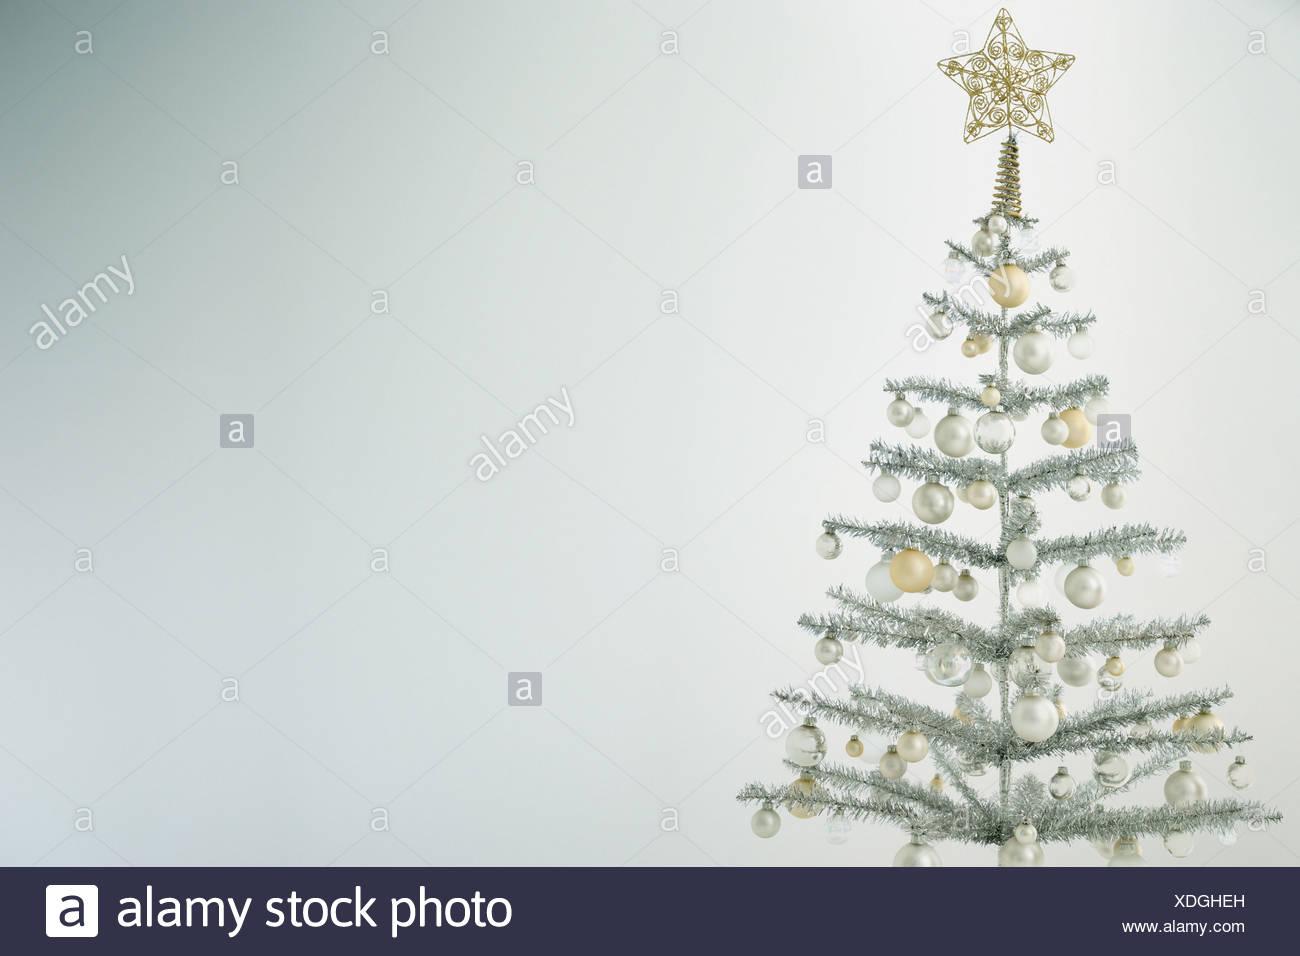 Silver christmas tree stock photo: 283721385 alamy